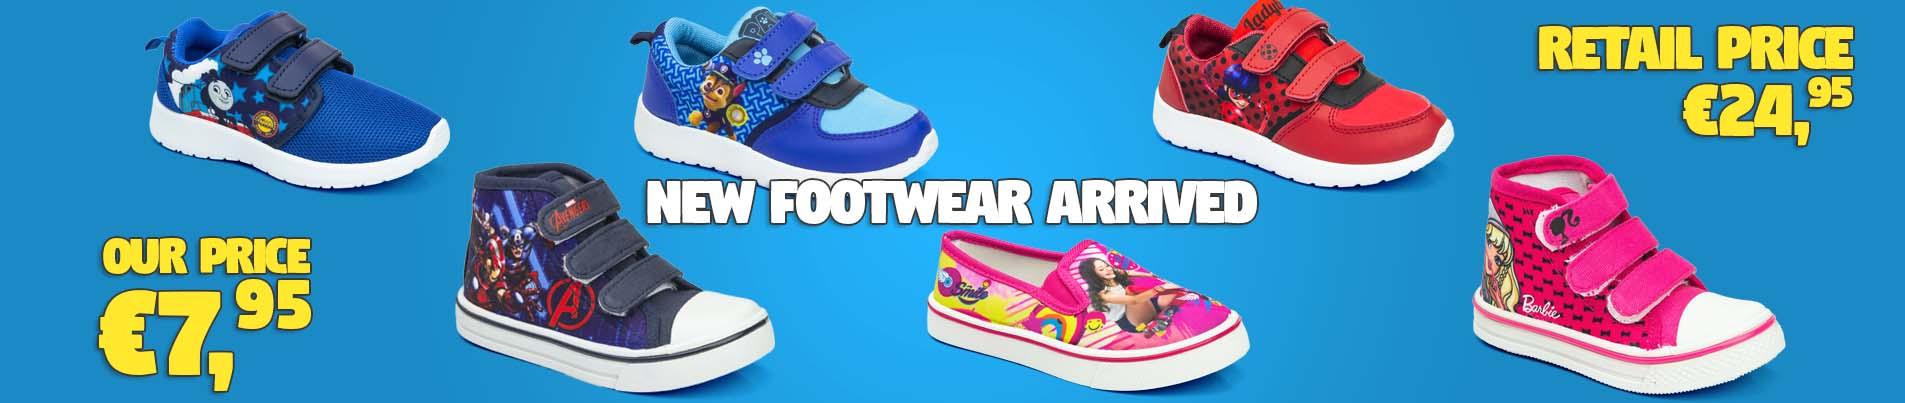 Wholesale footwear for kids.